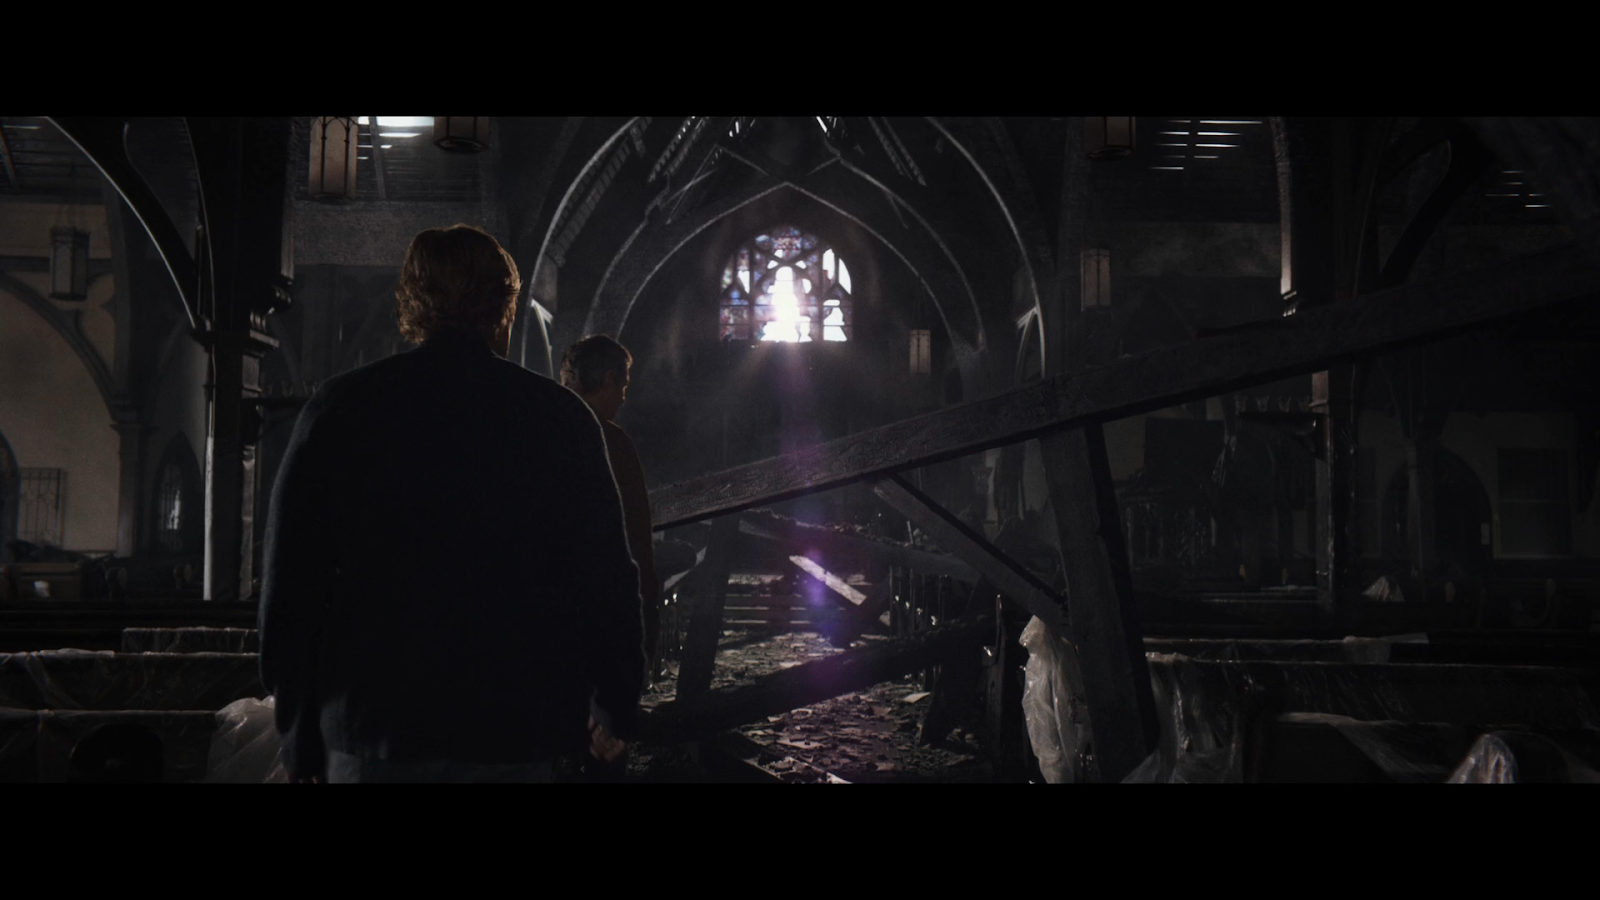 Dios no está muerto 3 (2018) BRRip Full HD 1080p Latino-Ingles captura 3